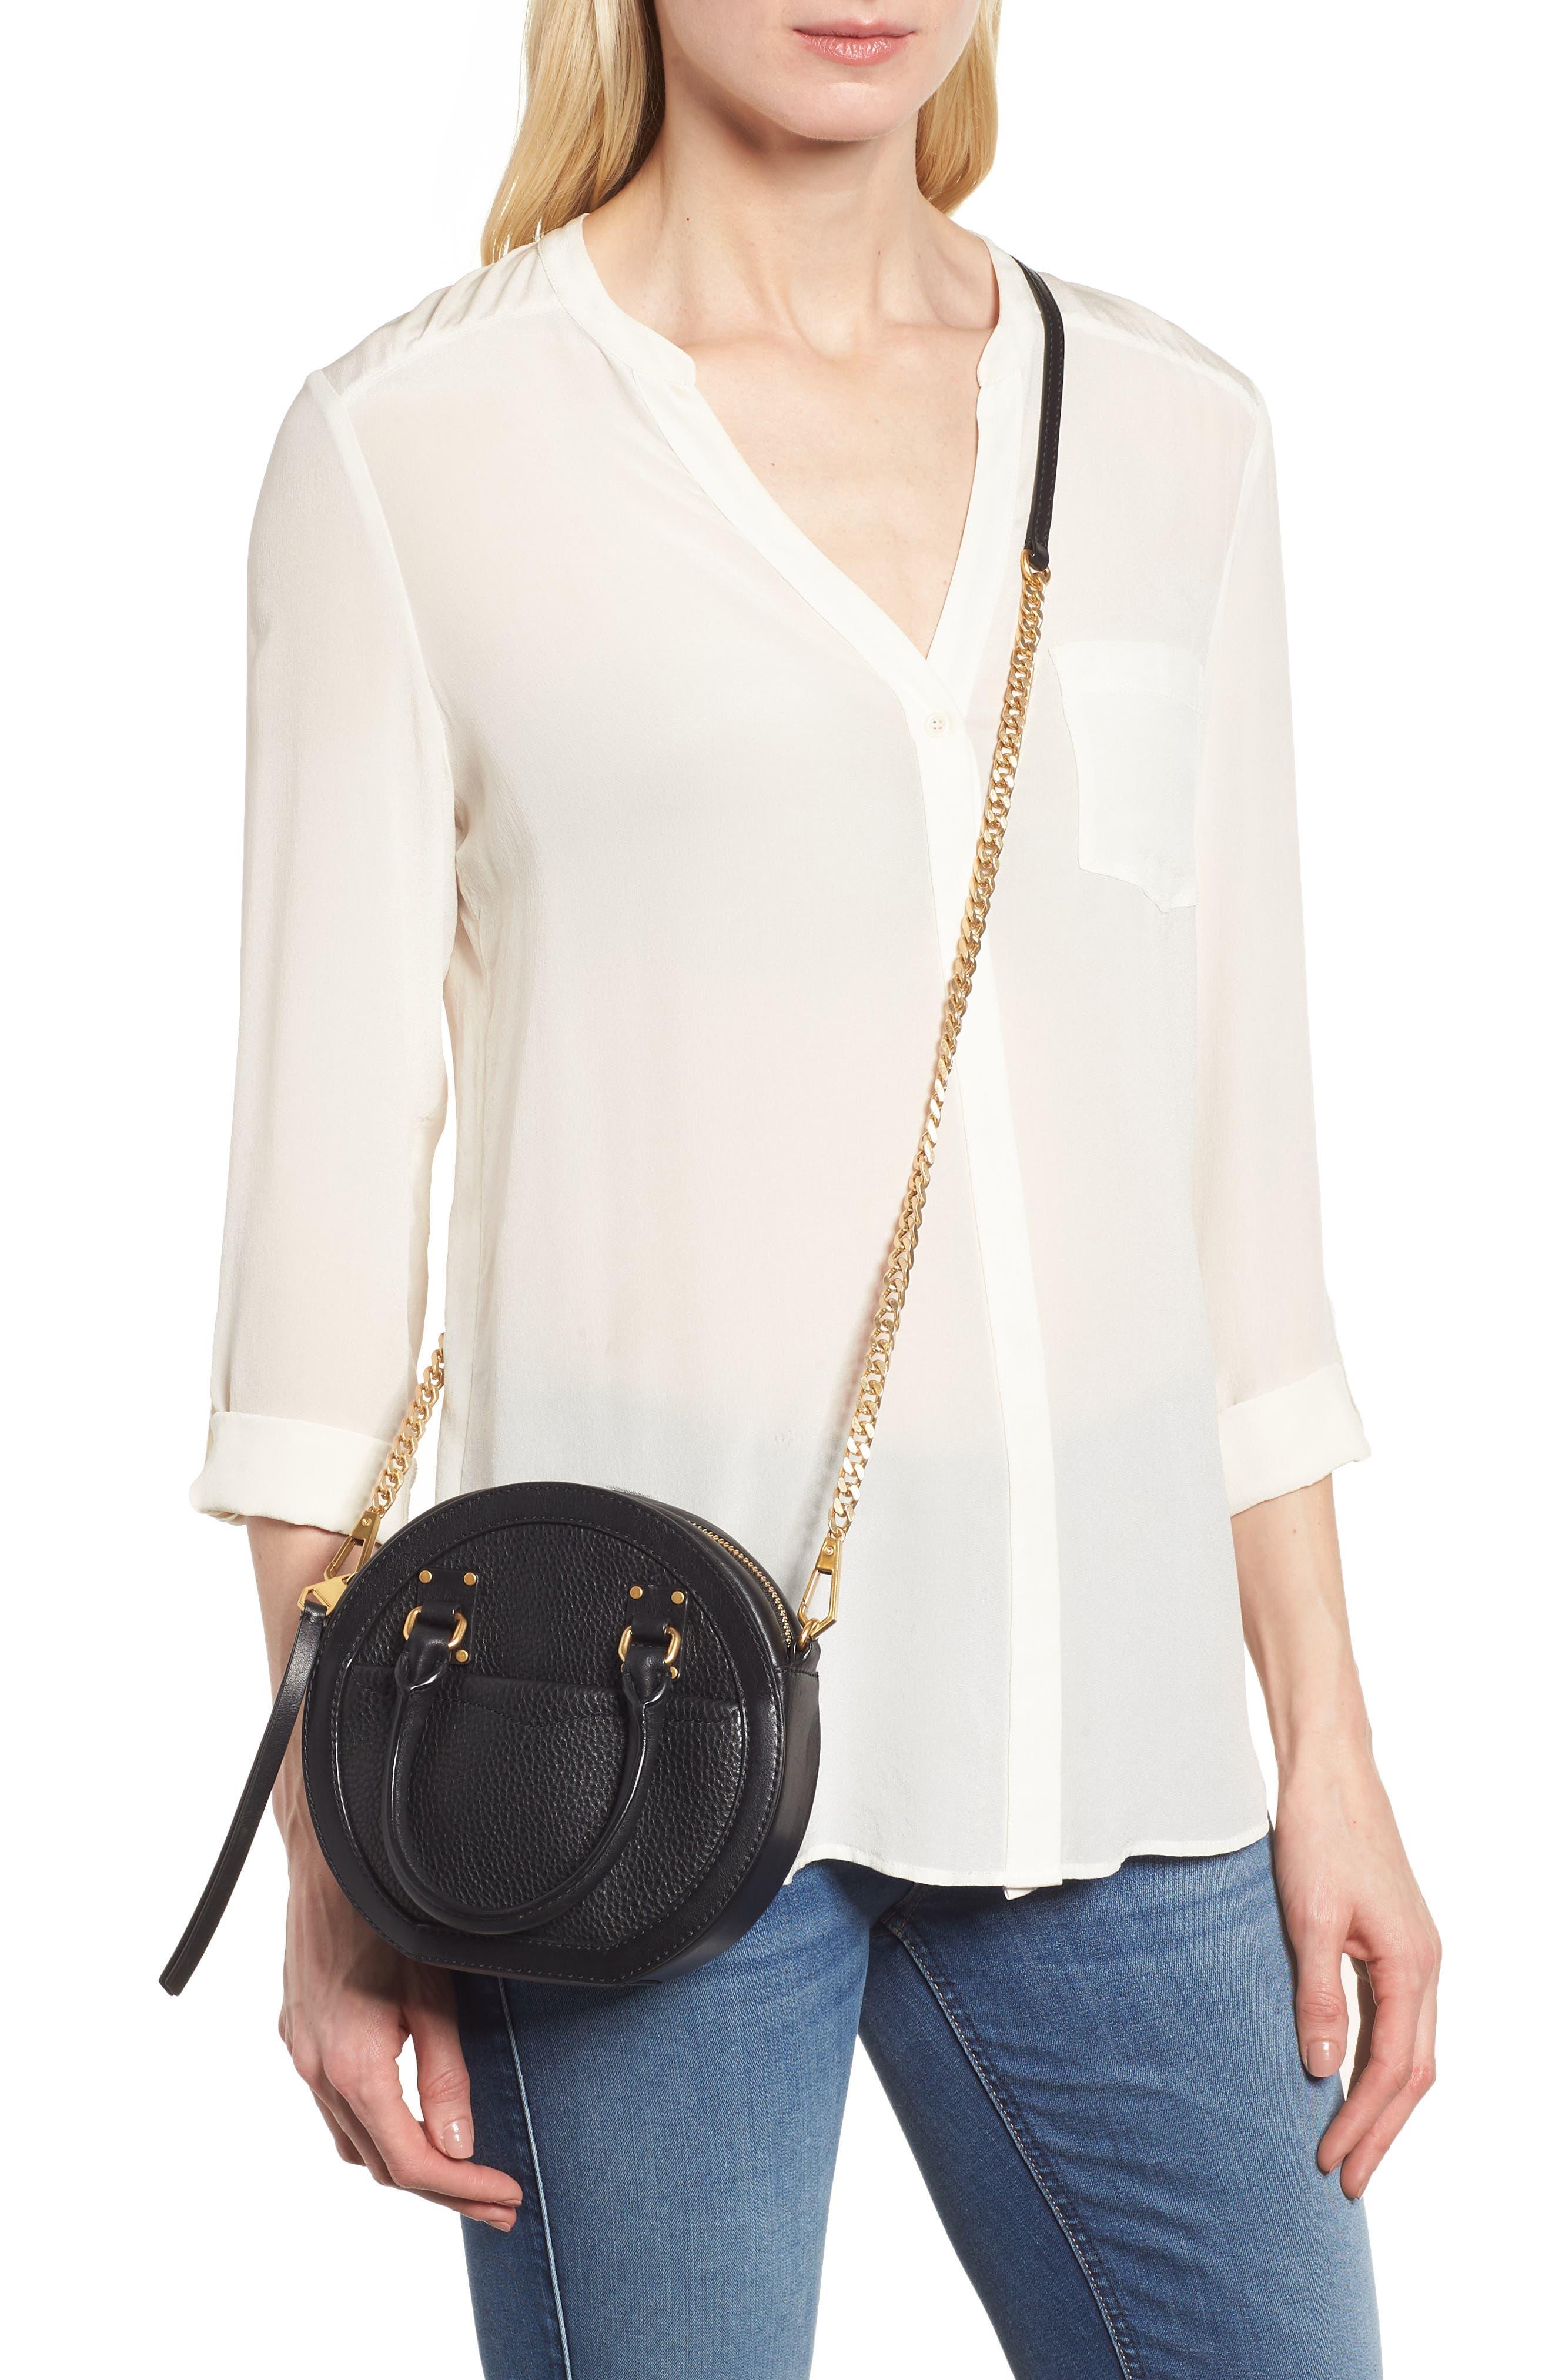 Bree Circle Leather Crossbody Bag,                             Alternate thumbnail 2, color,                             Black